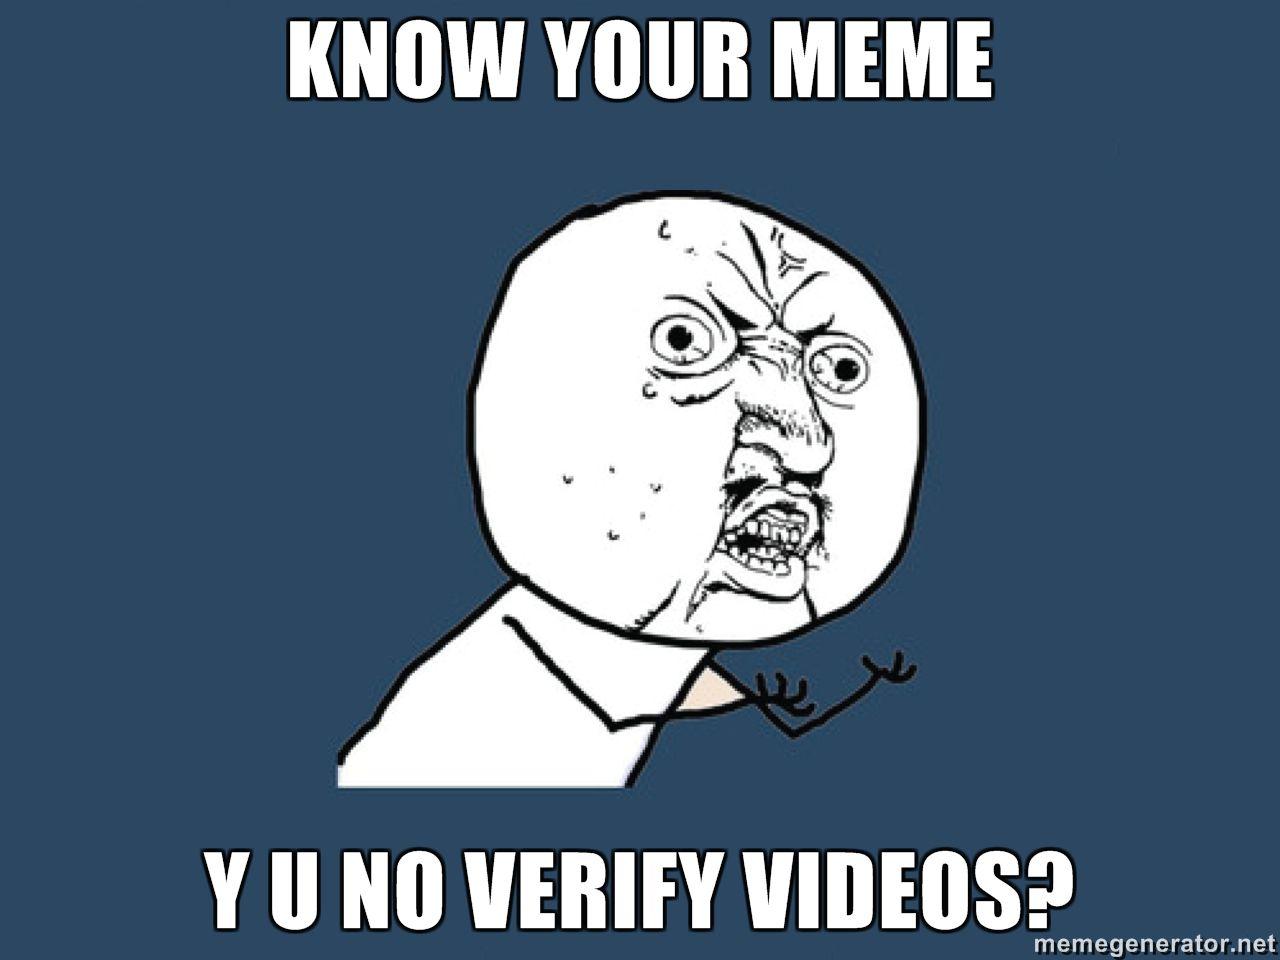 KNOW YOUR MEME Y U NO VERIFY VIDEOS image 91221] knowyourmeme know your meme